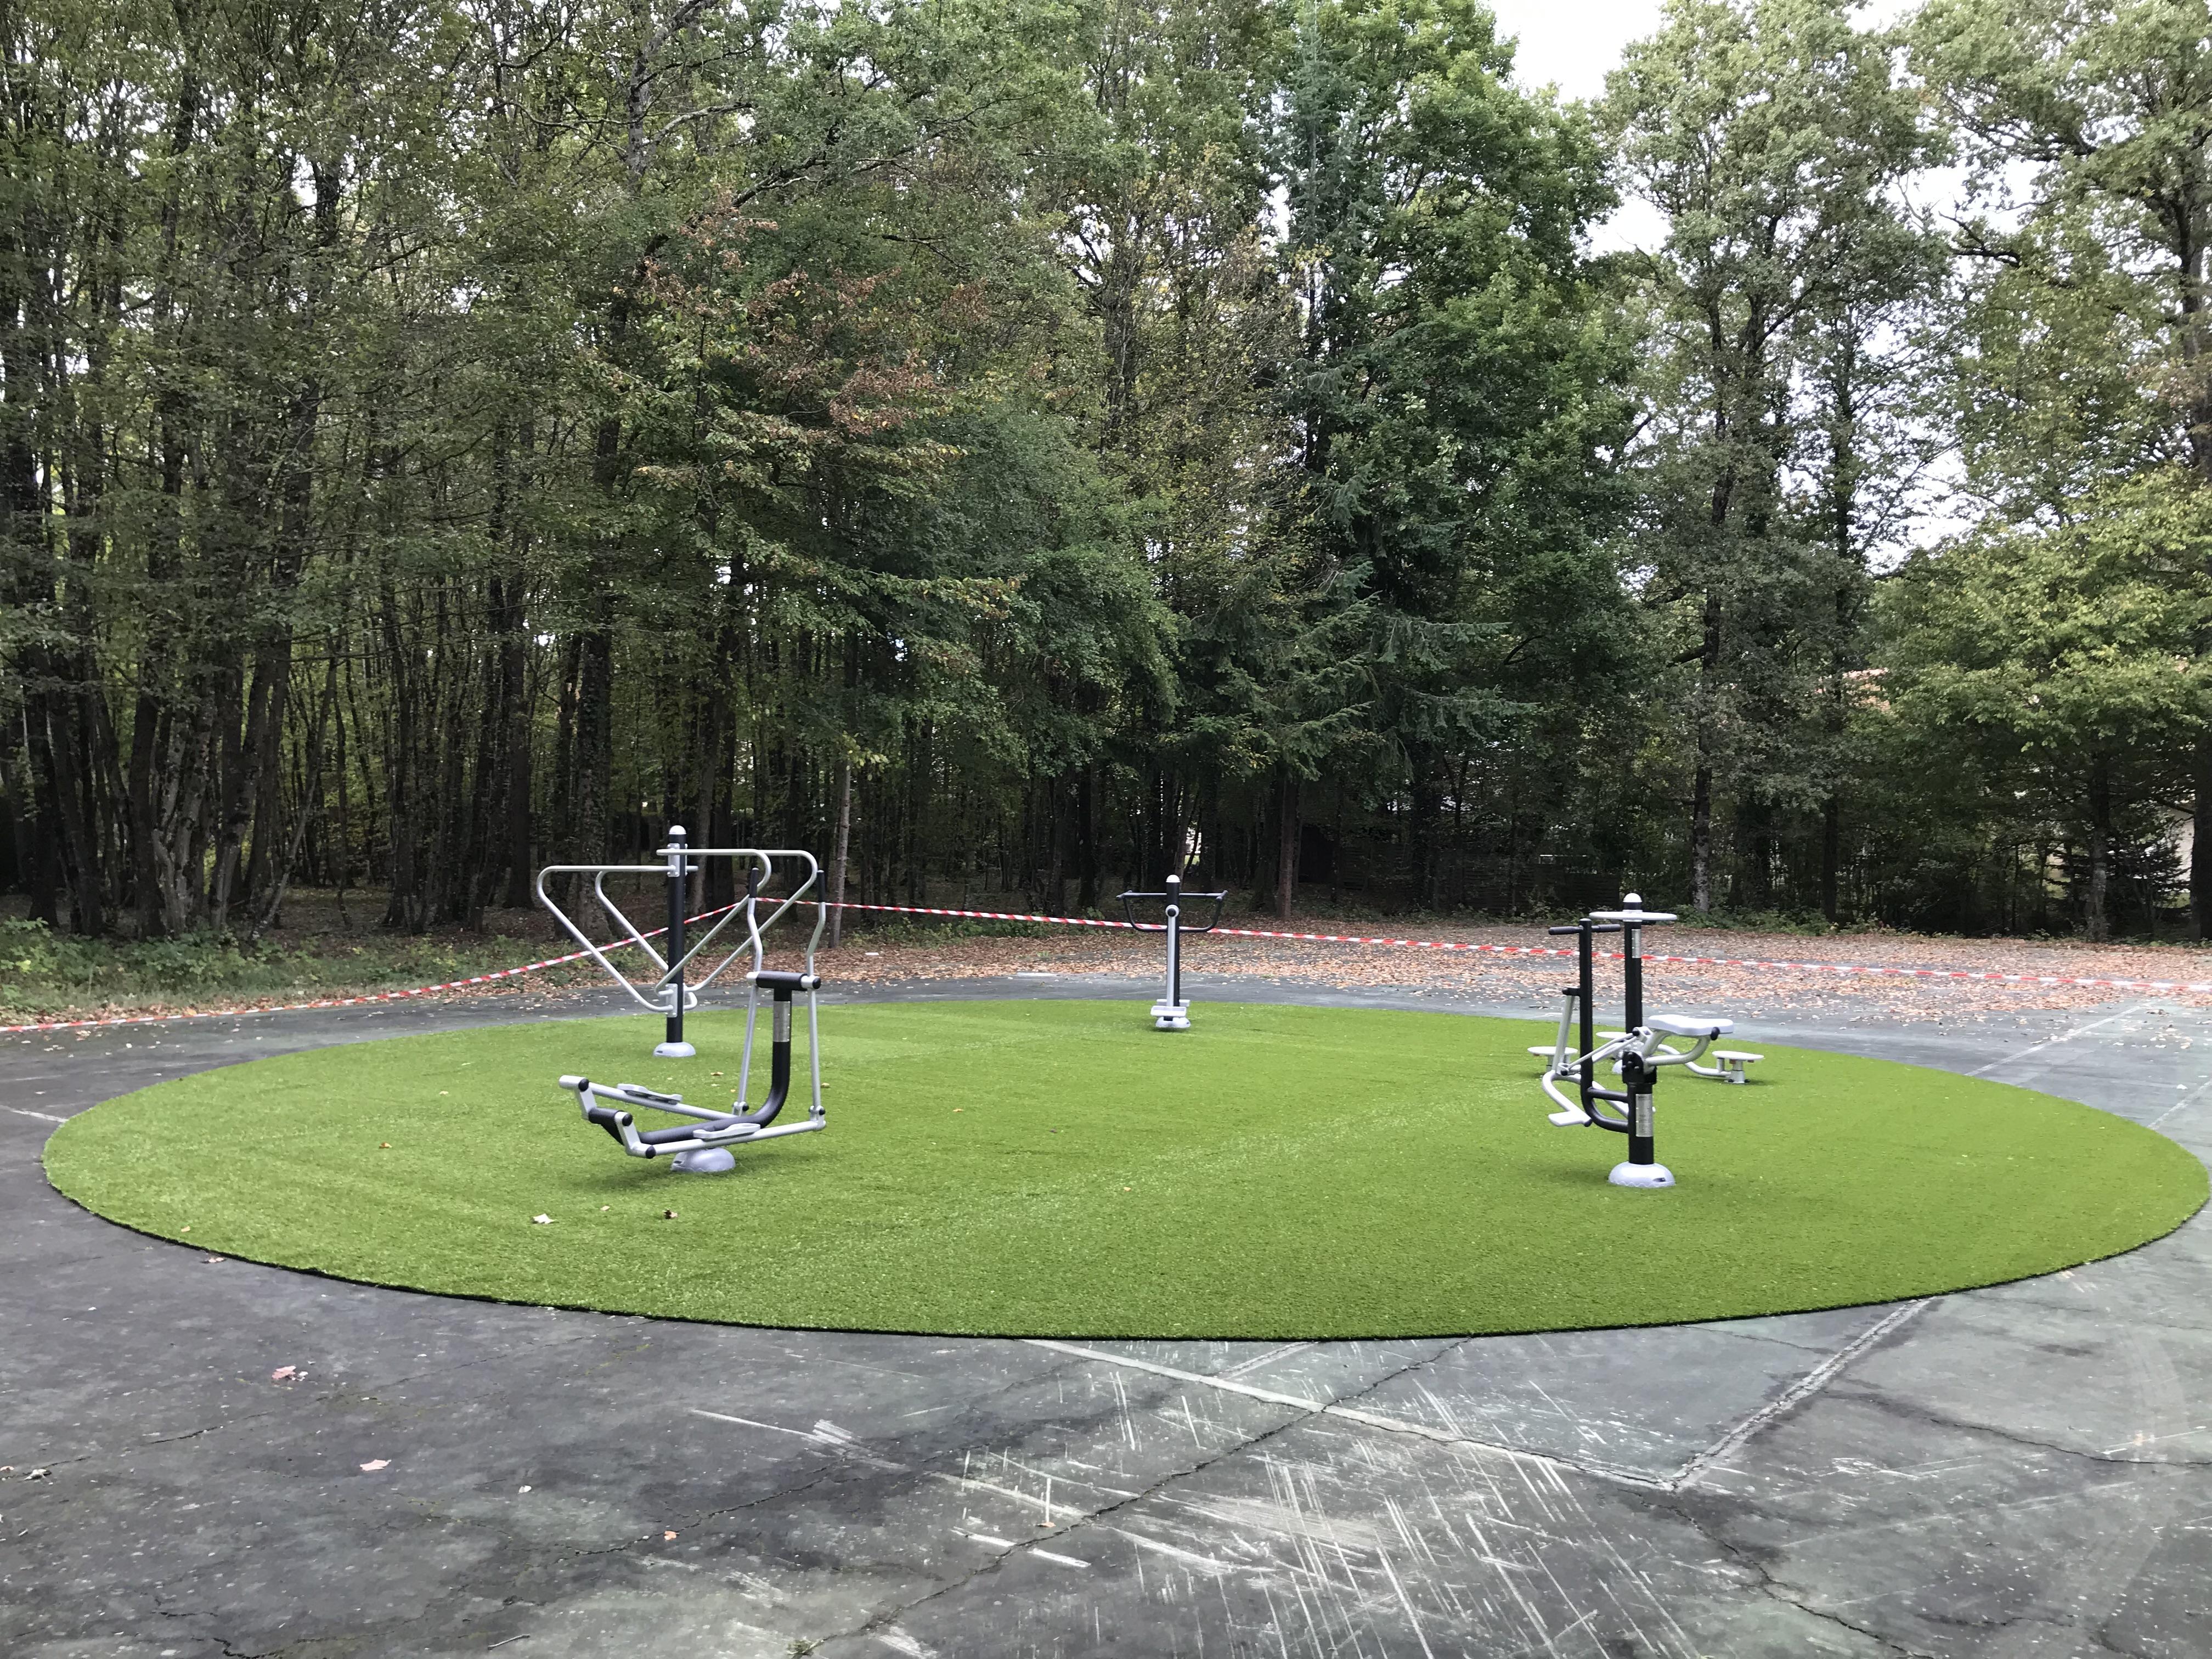 Aire de fitness 2019.10.10.JPG (13)